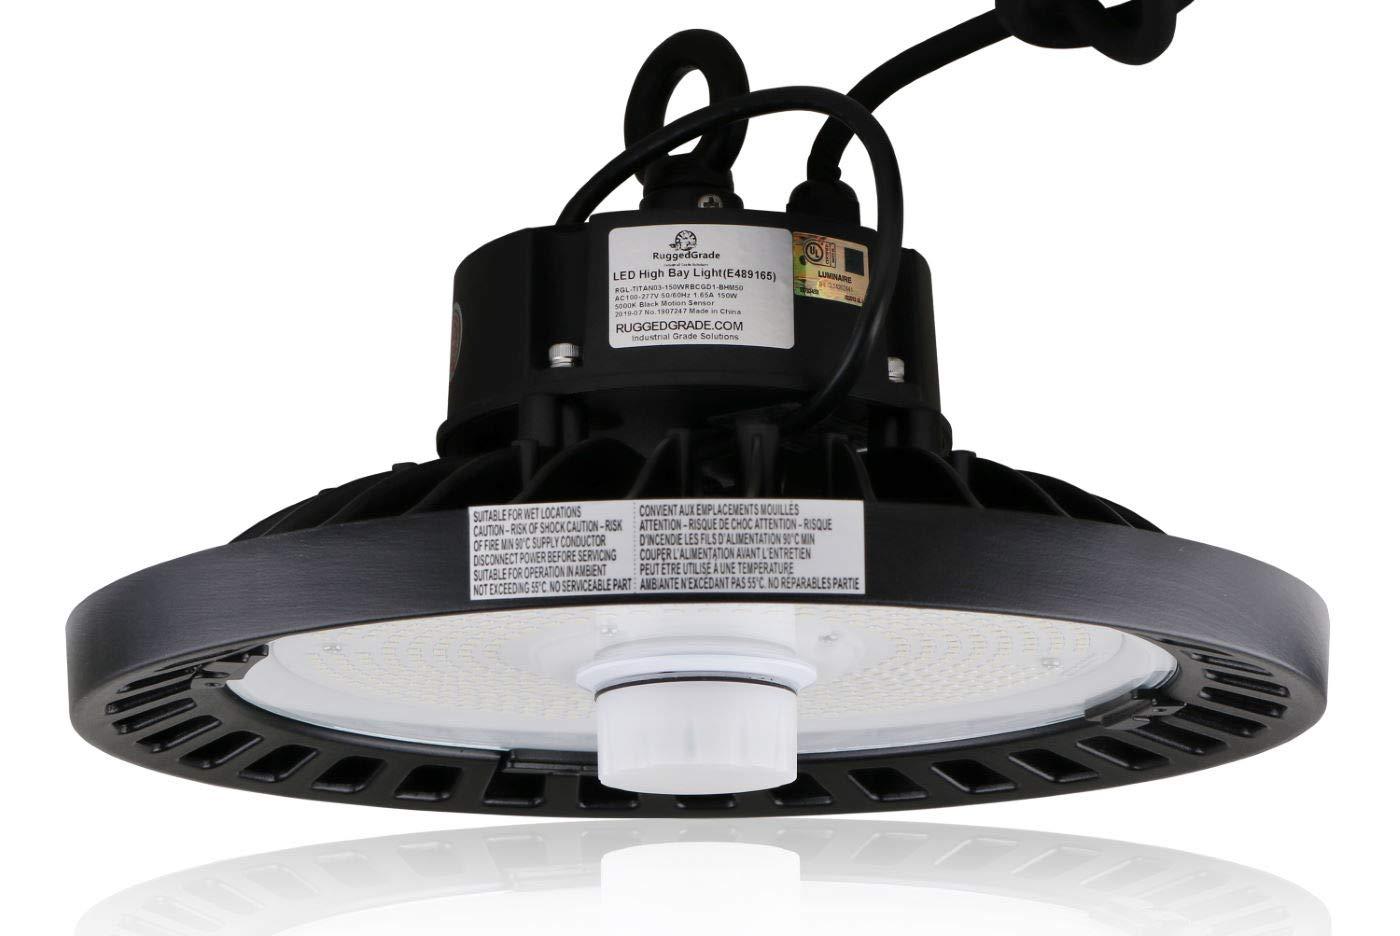 Dimmable 14,500 Lumen Titan III 100 Watt LED High Bay Light